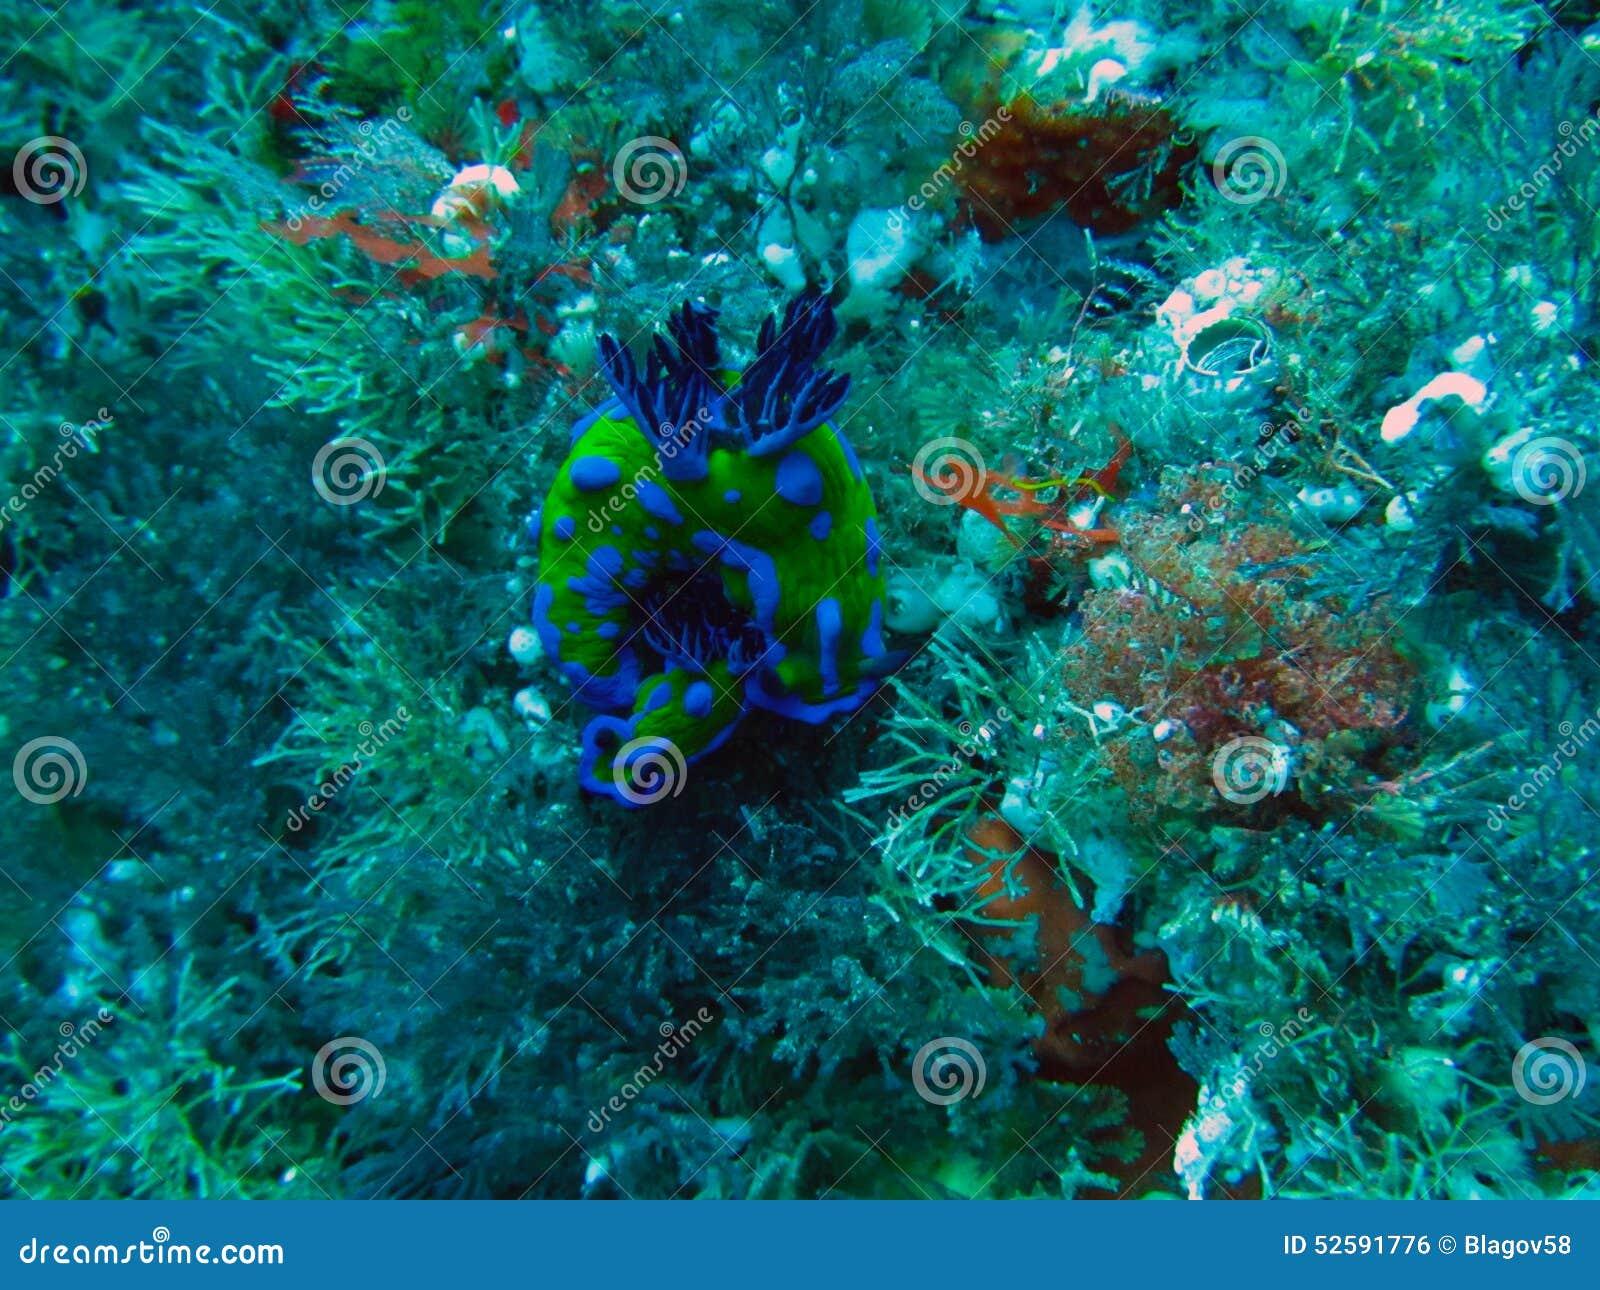 Poor Knights Islands Marine Reserve underwater